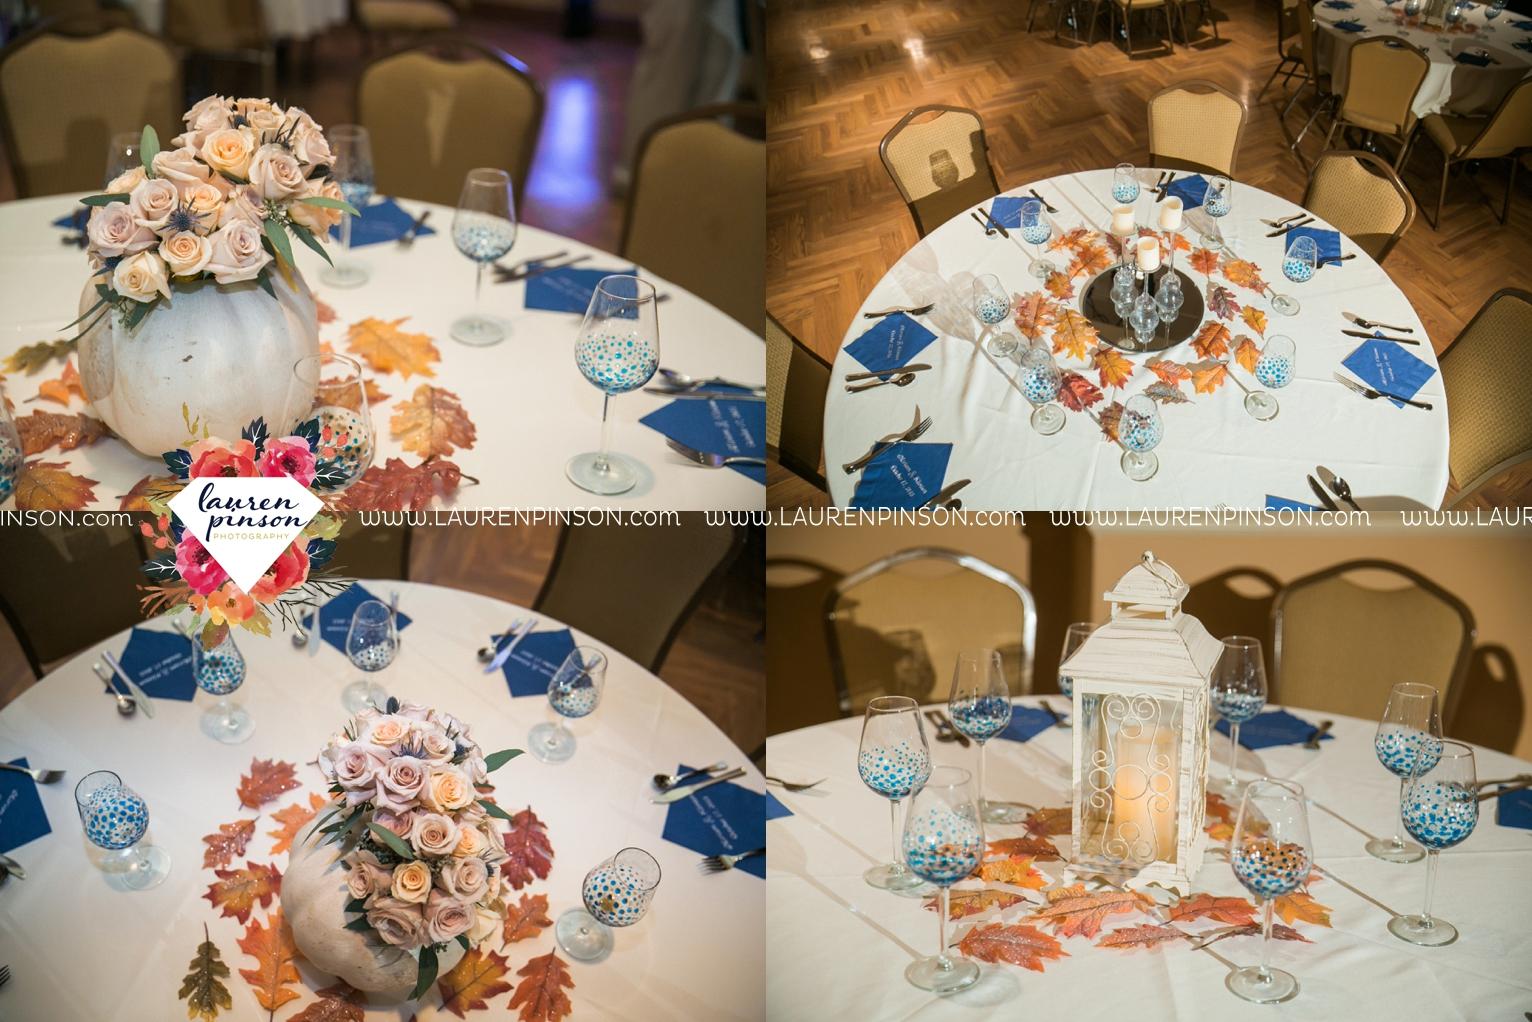 kemp-center-for-the-arts-wichita-falls-texas-wedding-photographer-fall-wedding-pumpkins-185.jpg